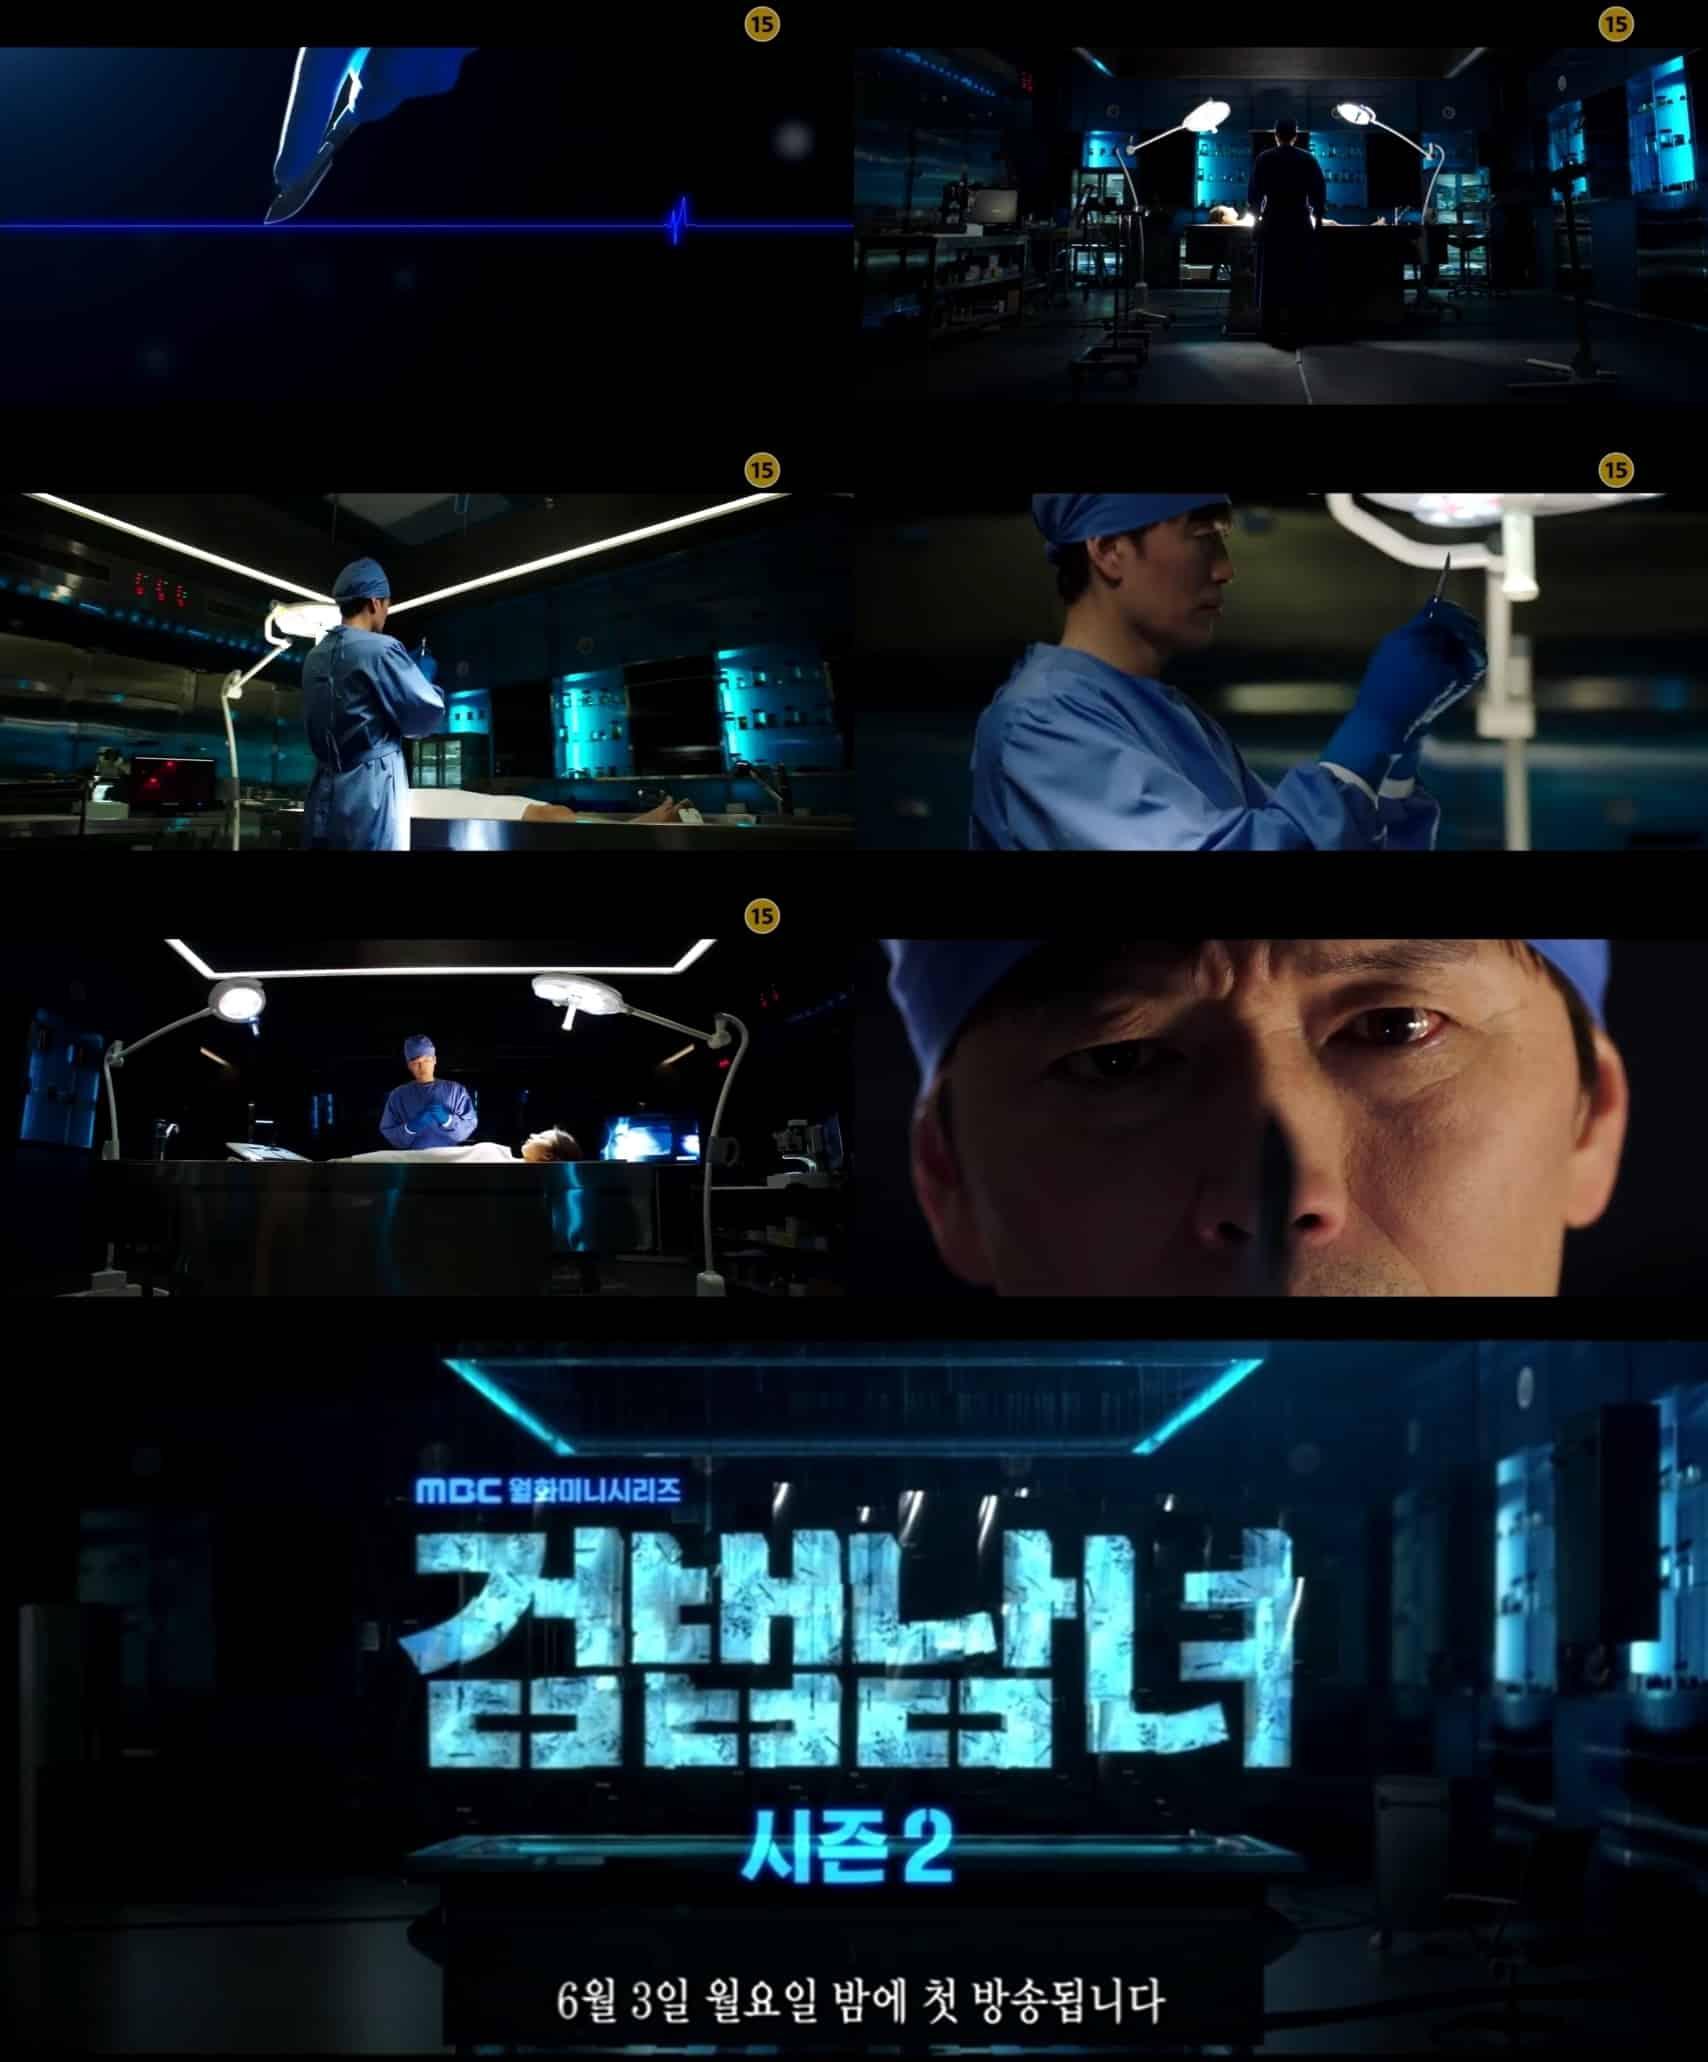 Partners for Justice Season 2 ศพ ซ่อน ปม ปี 2 ซับไทย EP1-EP32 [จบ]